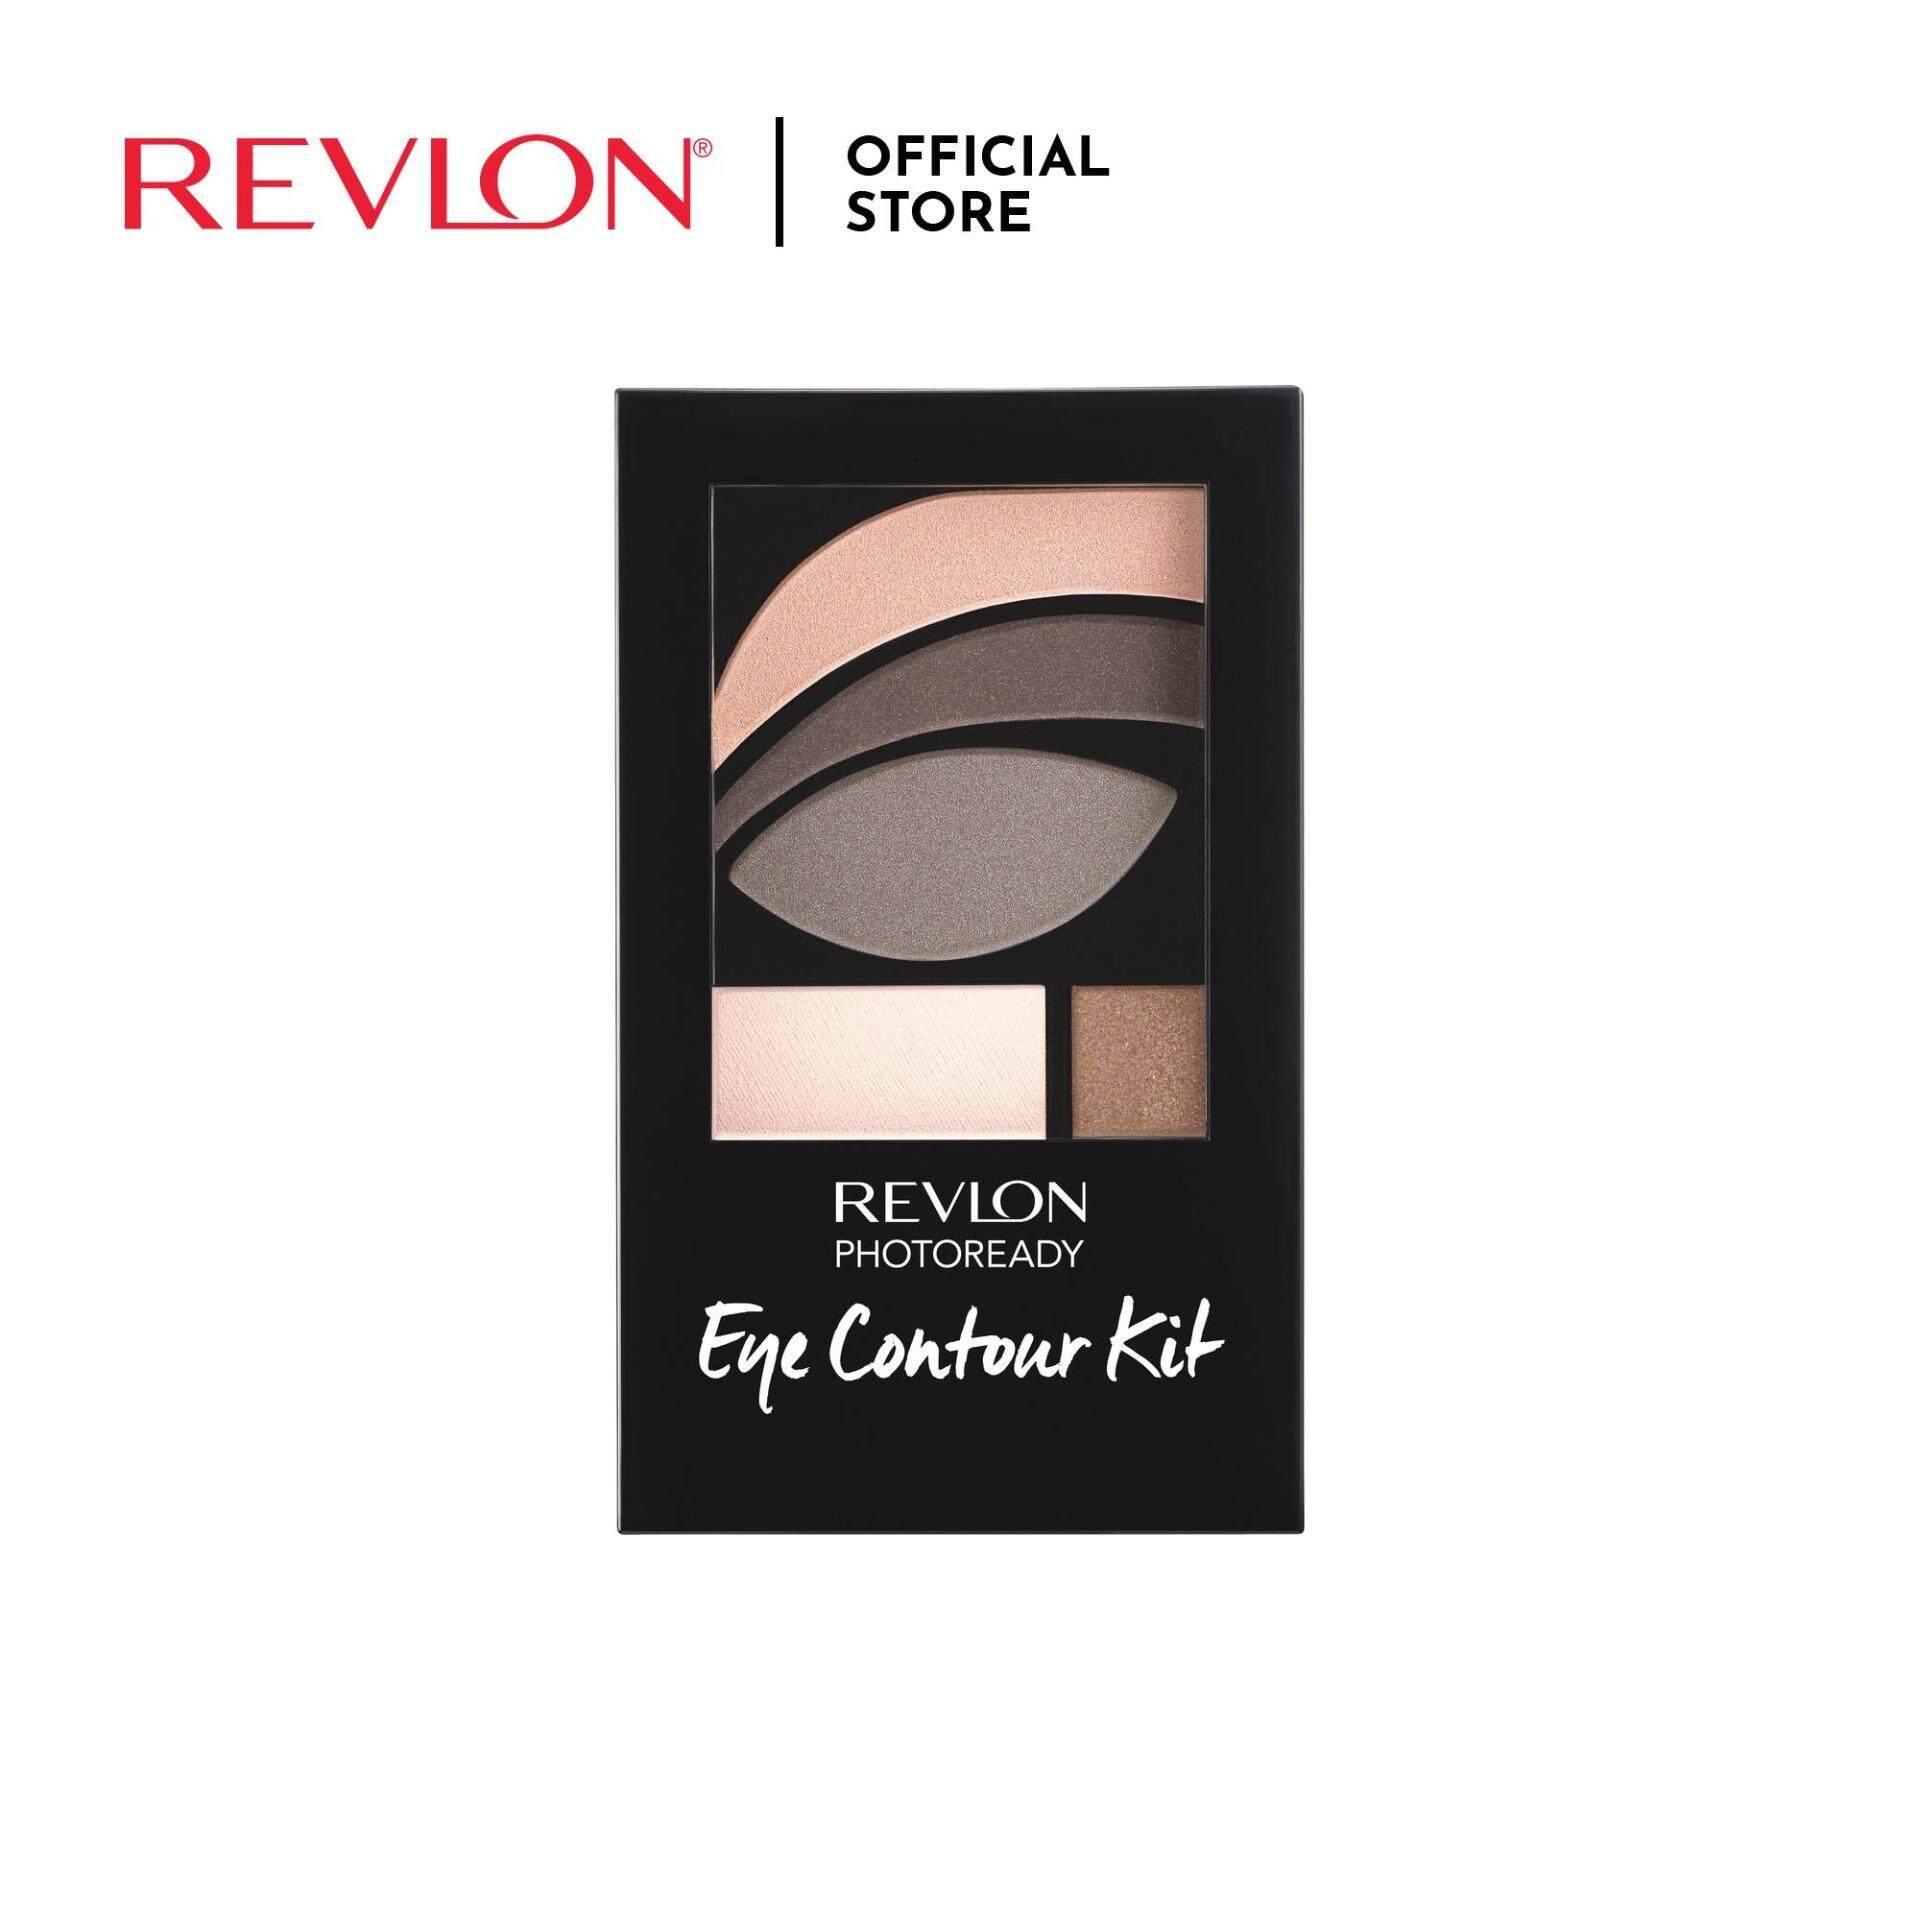 Revlon Photoready Eye Contour Kit -Metropolitan 501